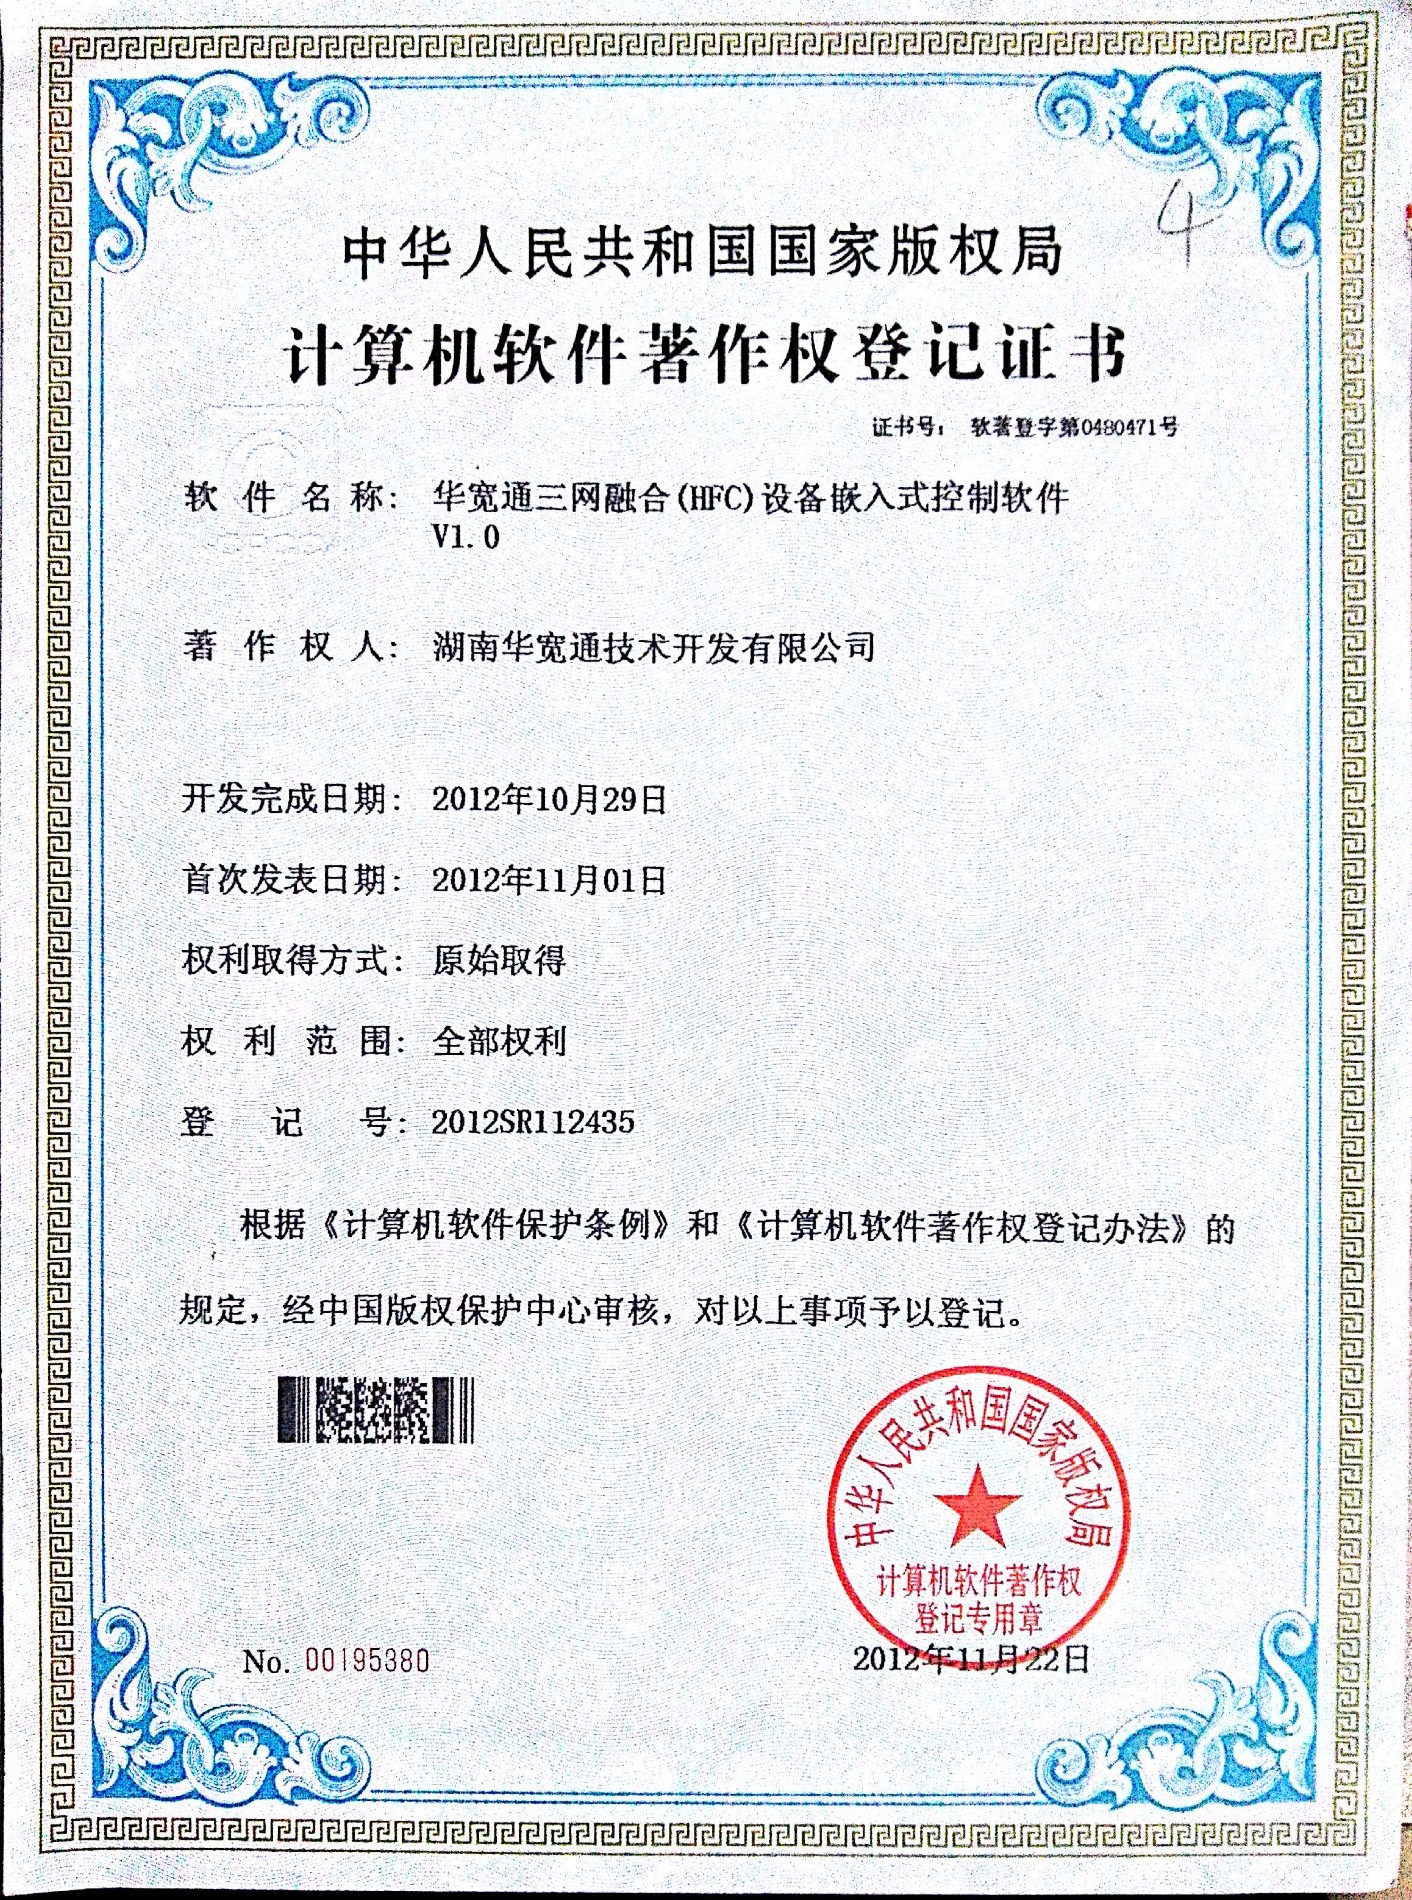 Computer software copyright registration